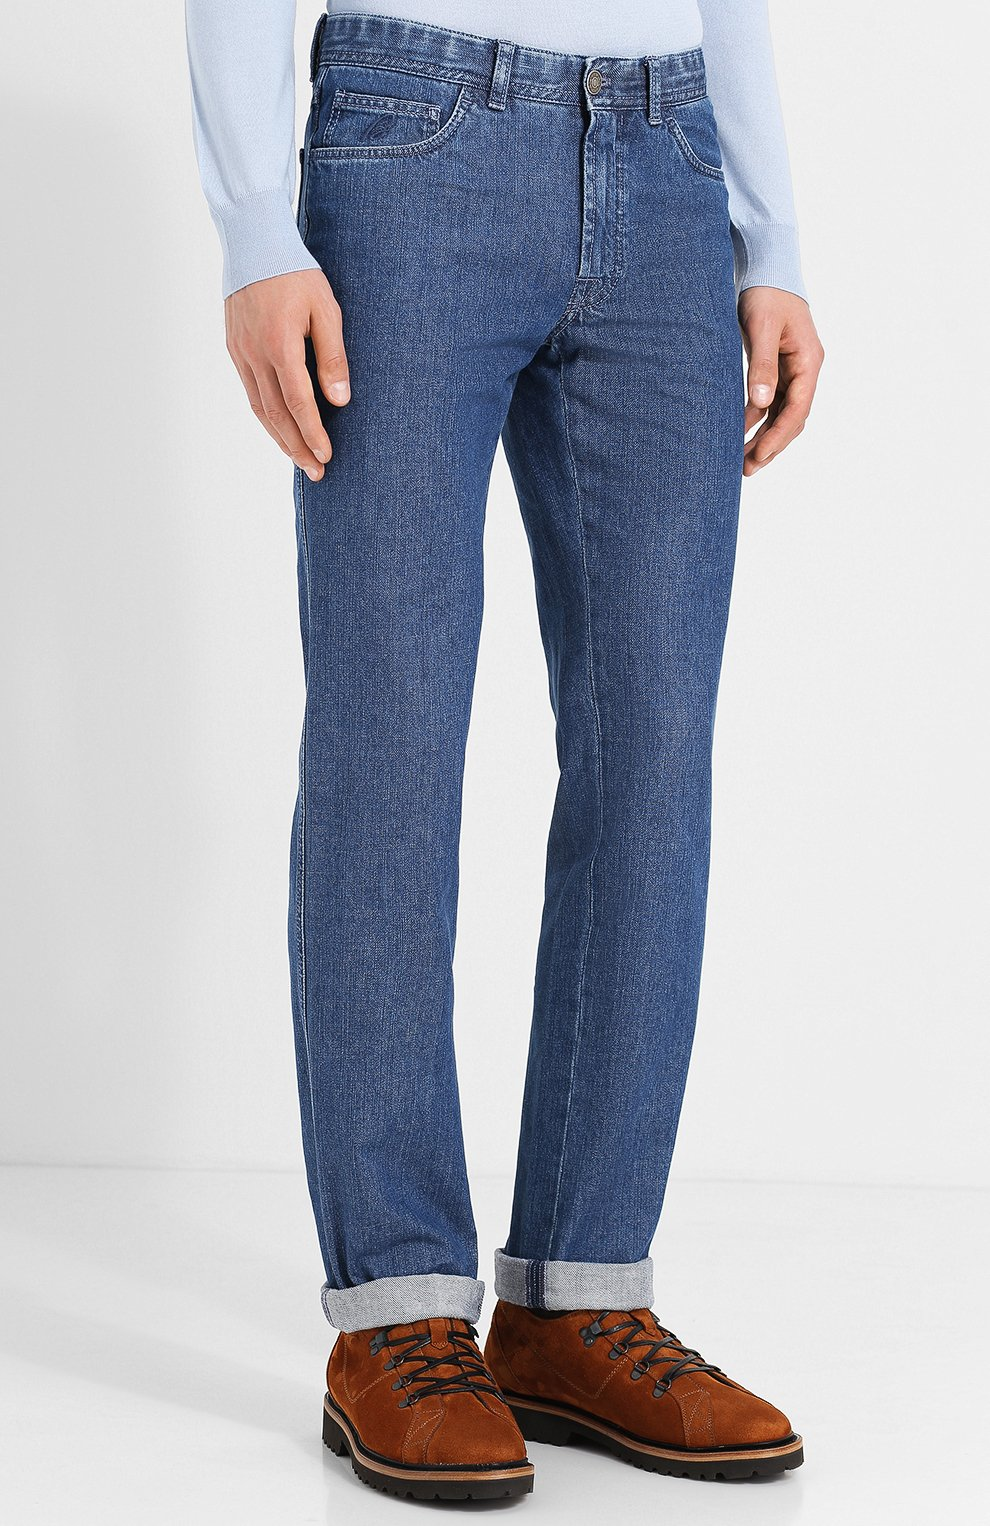 Мужские джинсы прямого кроя BRIONI синего цвета, арт. SPLE0L/07D13/CHAM0NIX | Фото 3